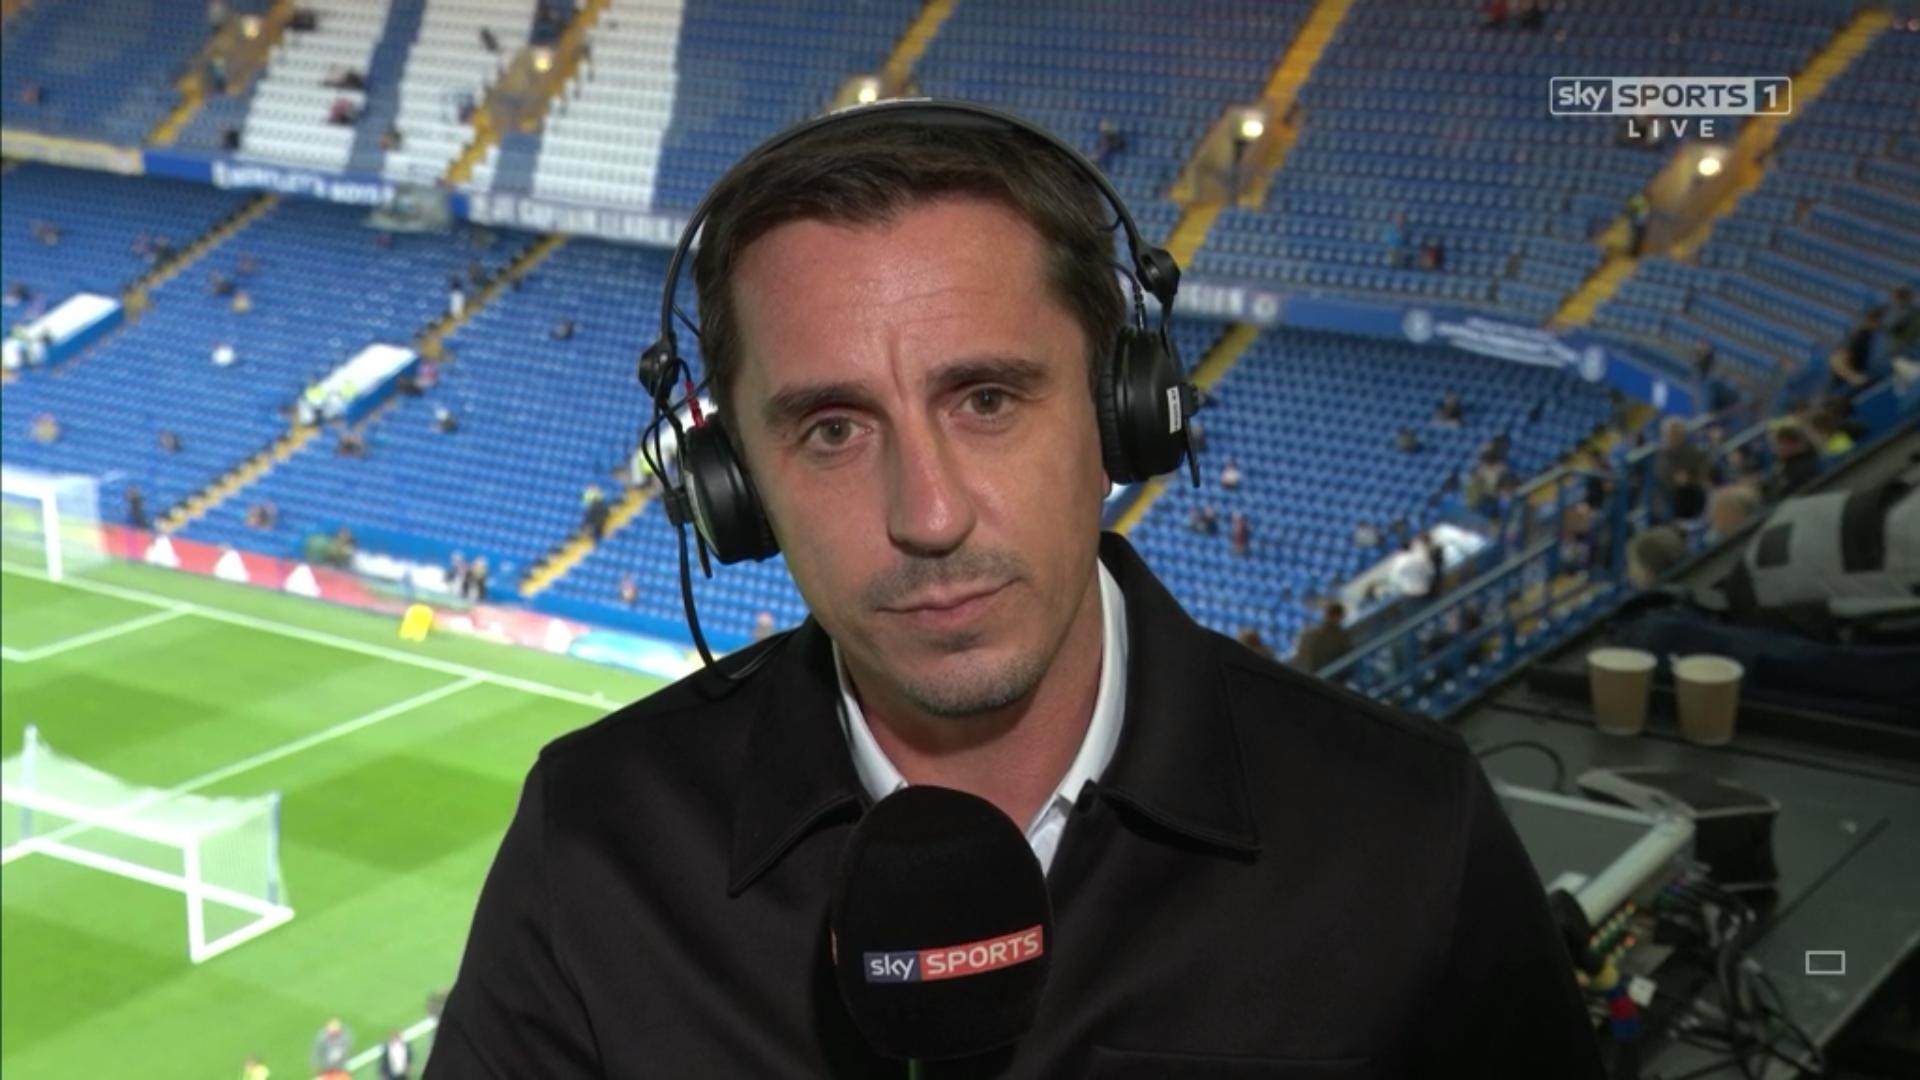 Gary Neville - Sky Sports Football Commentator (1)